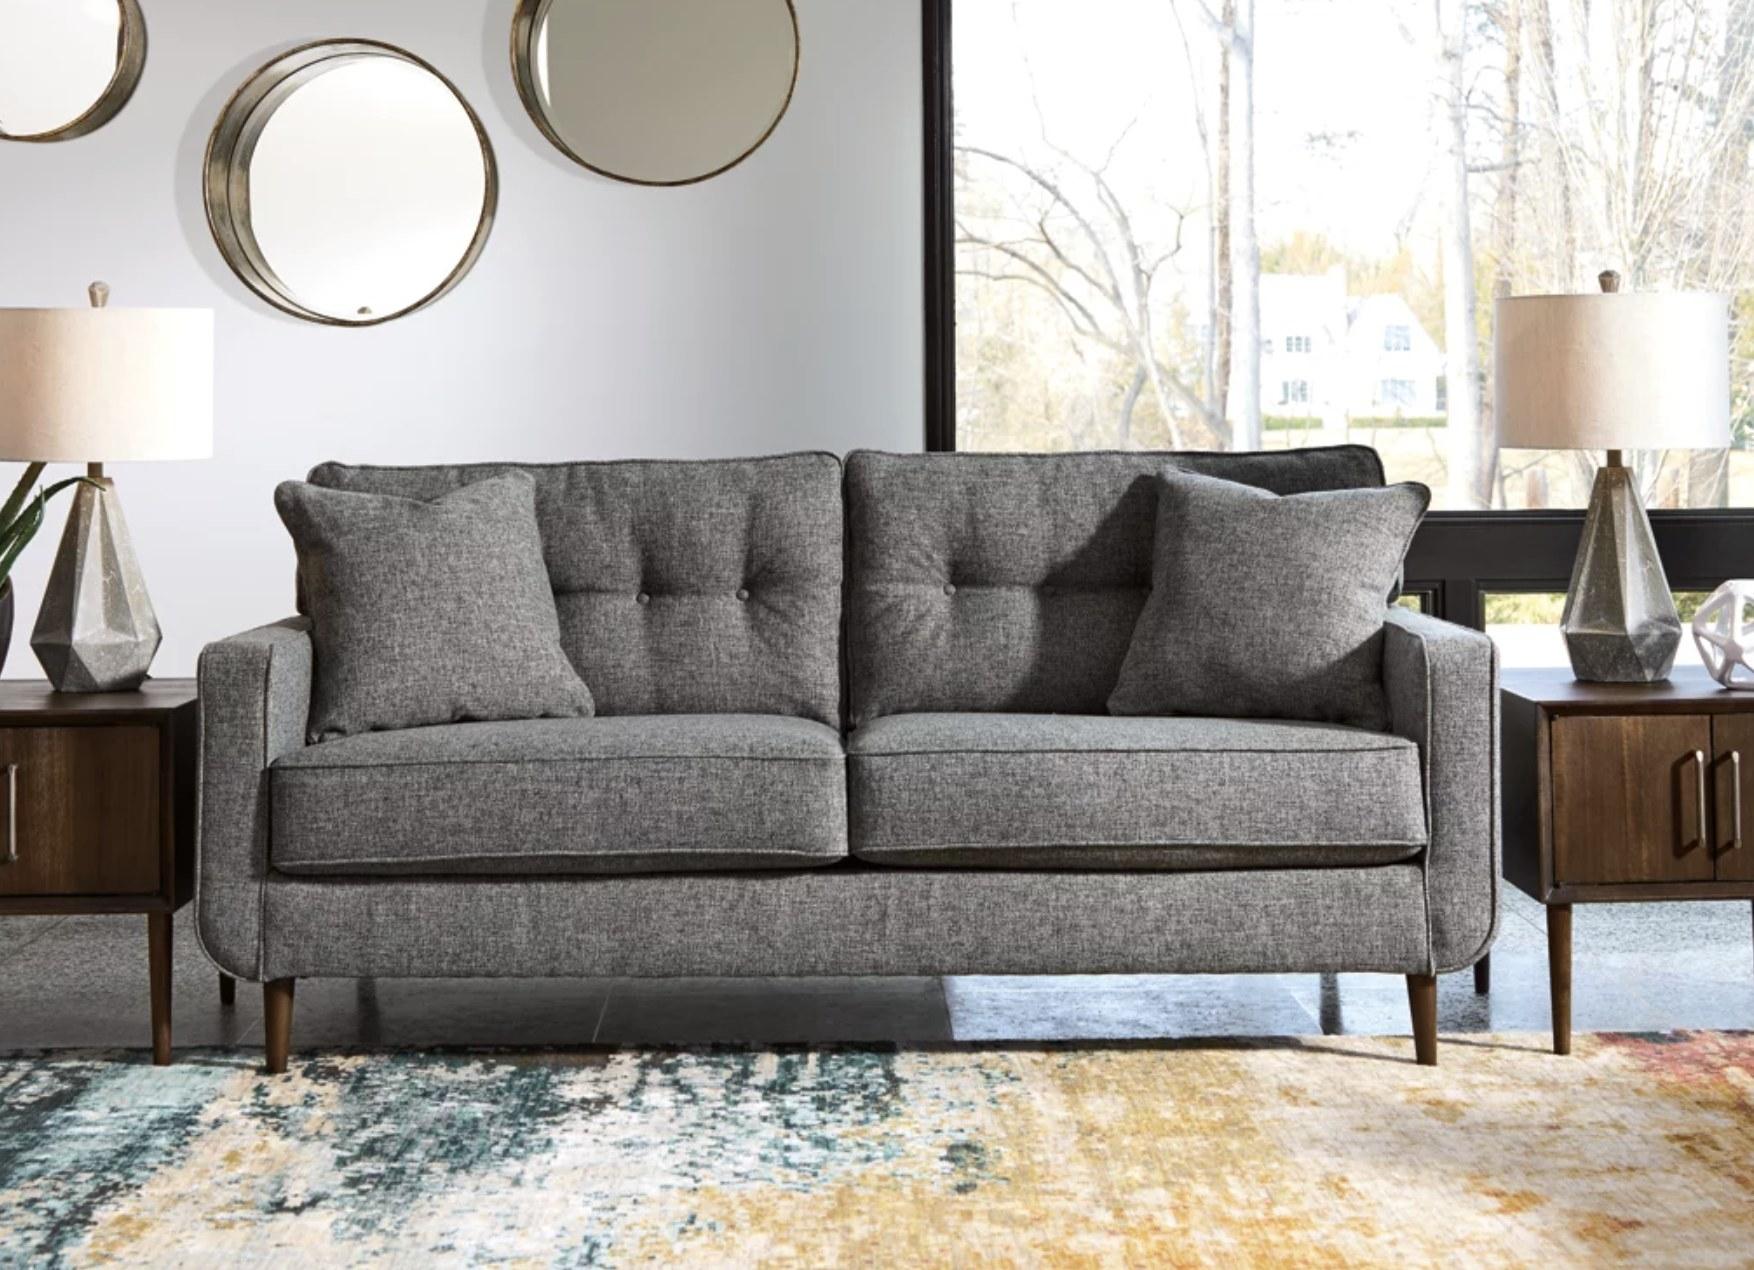 The grey sofa